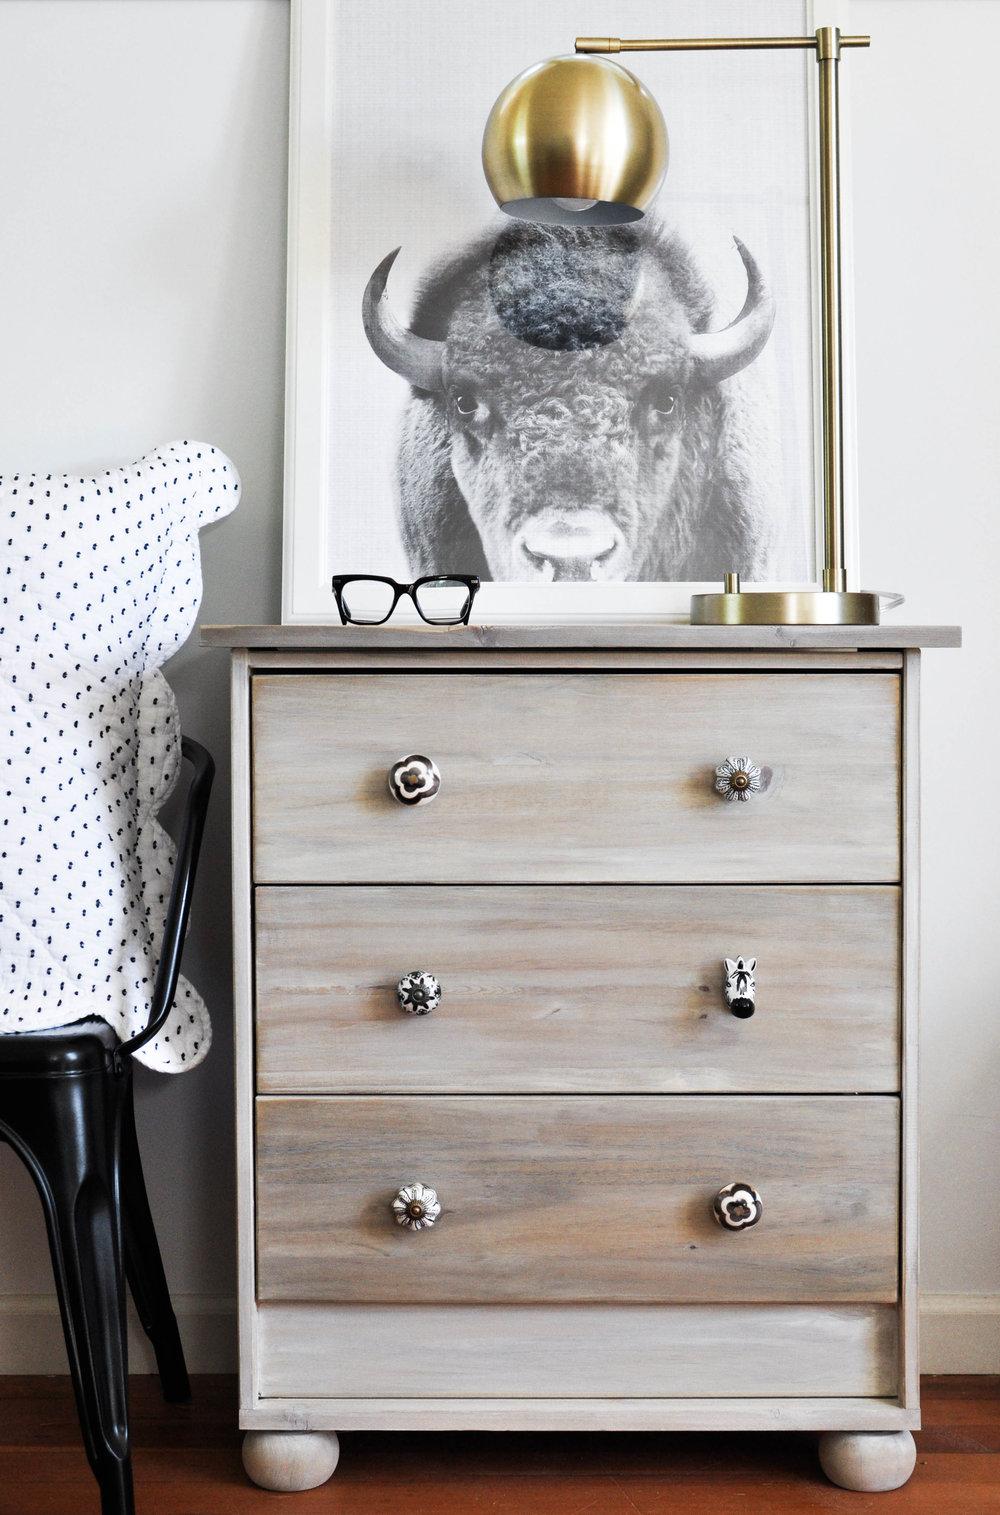 IkeaRastHack-18.jpg